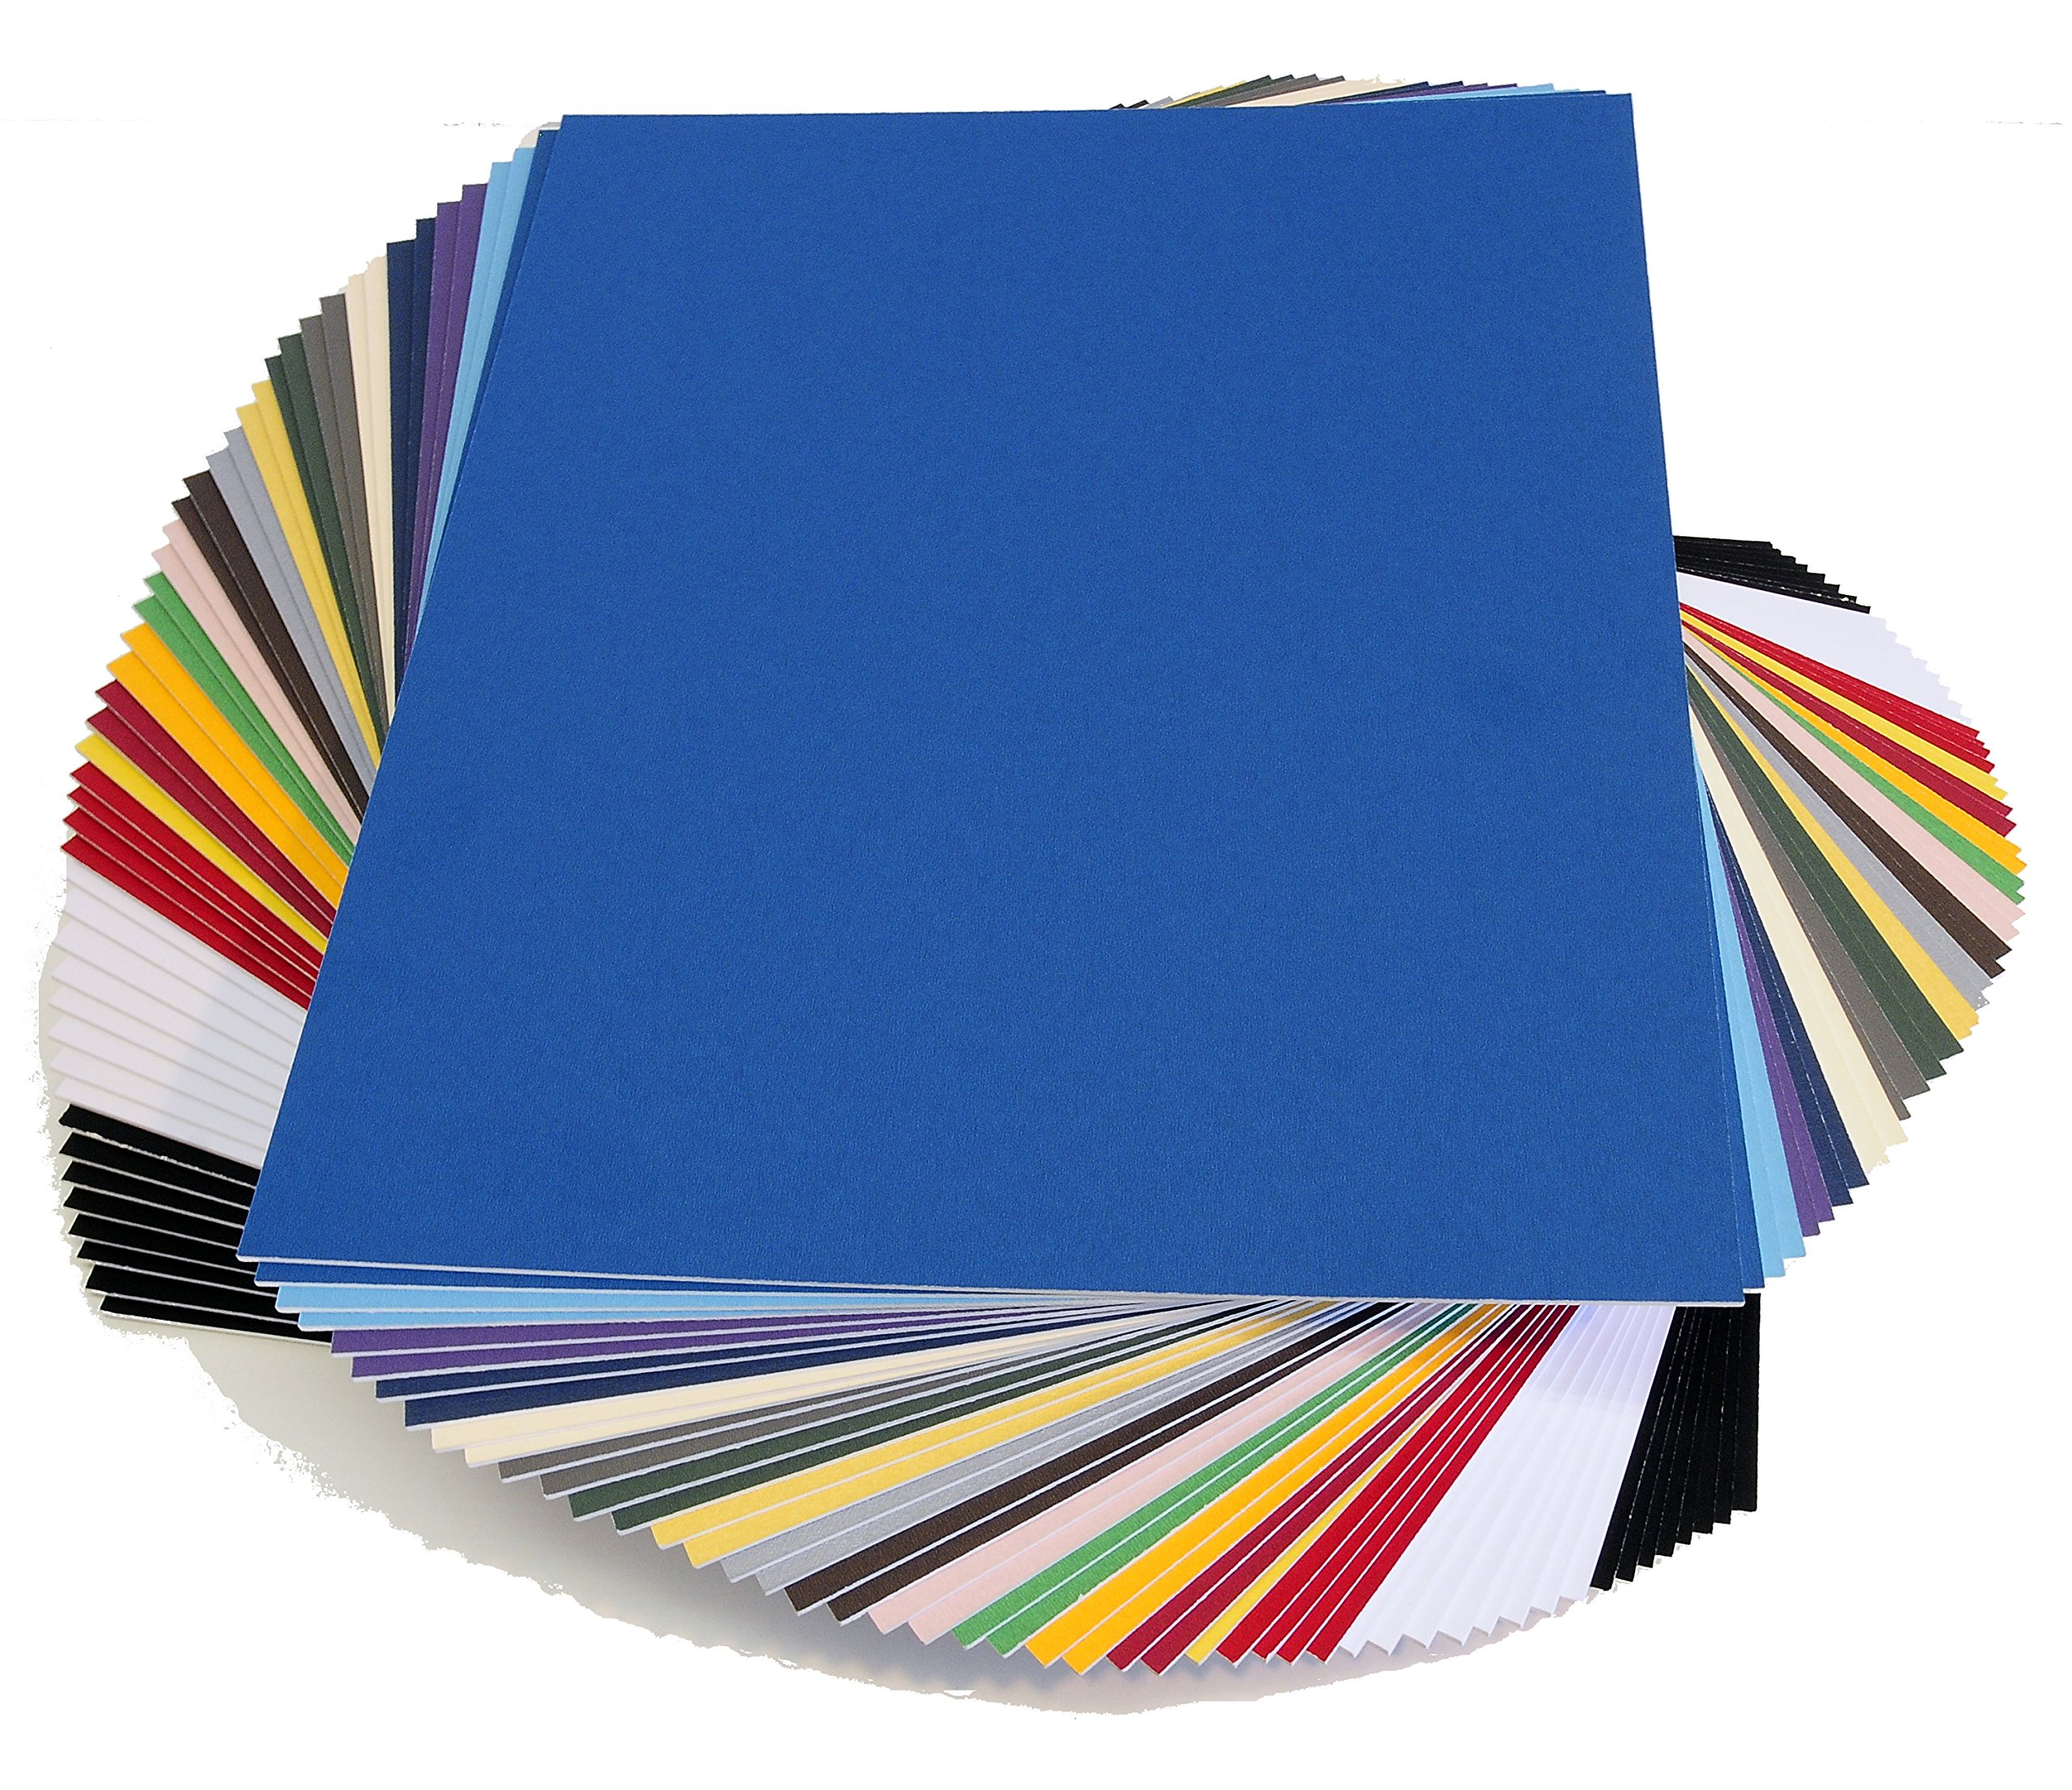 topseller100, Pack of 50 sheets 16x20 UNCUT matboard / mat boards (Mix)